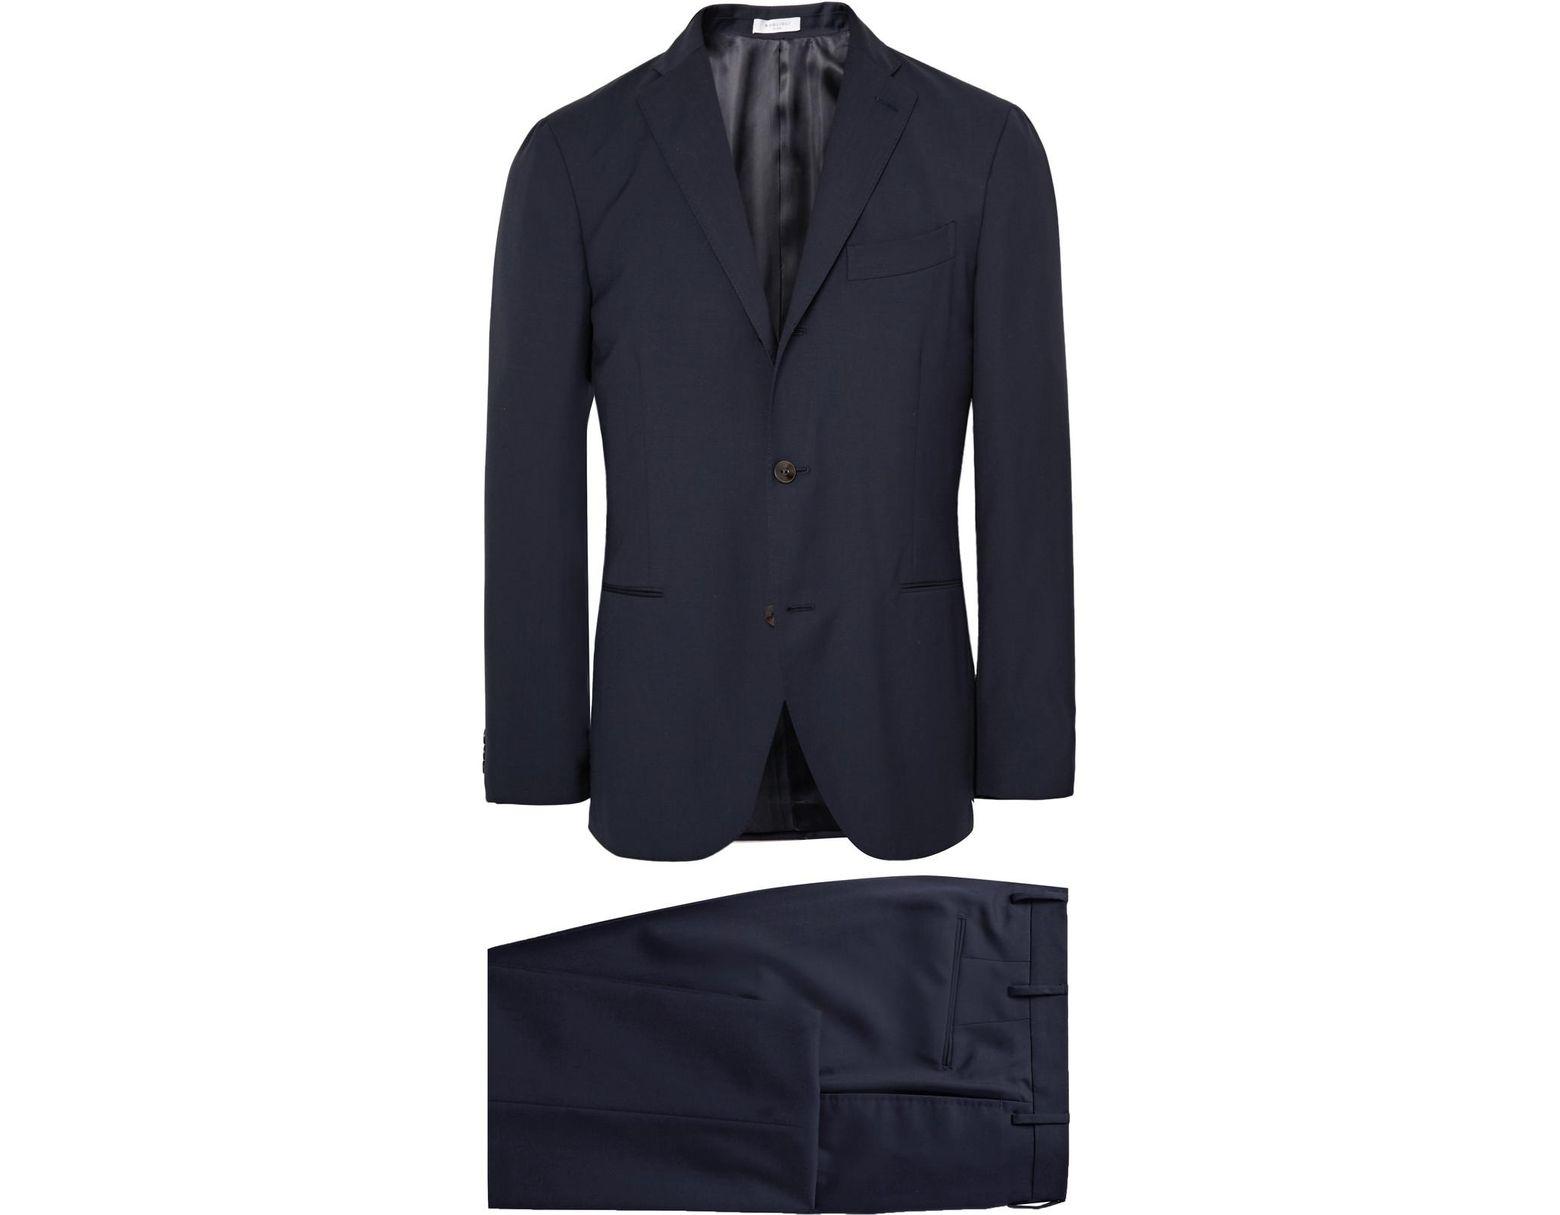 8b02708888 Men's Blue Dover Slim-fit Virgin Wool Suit